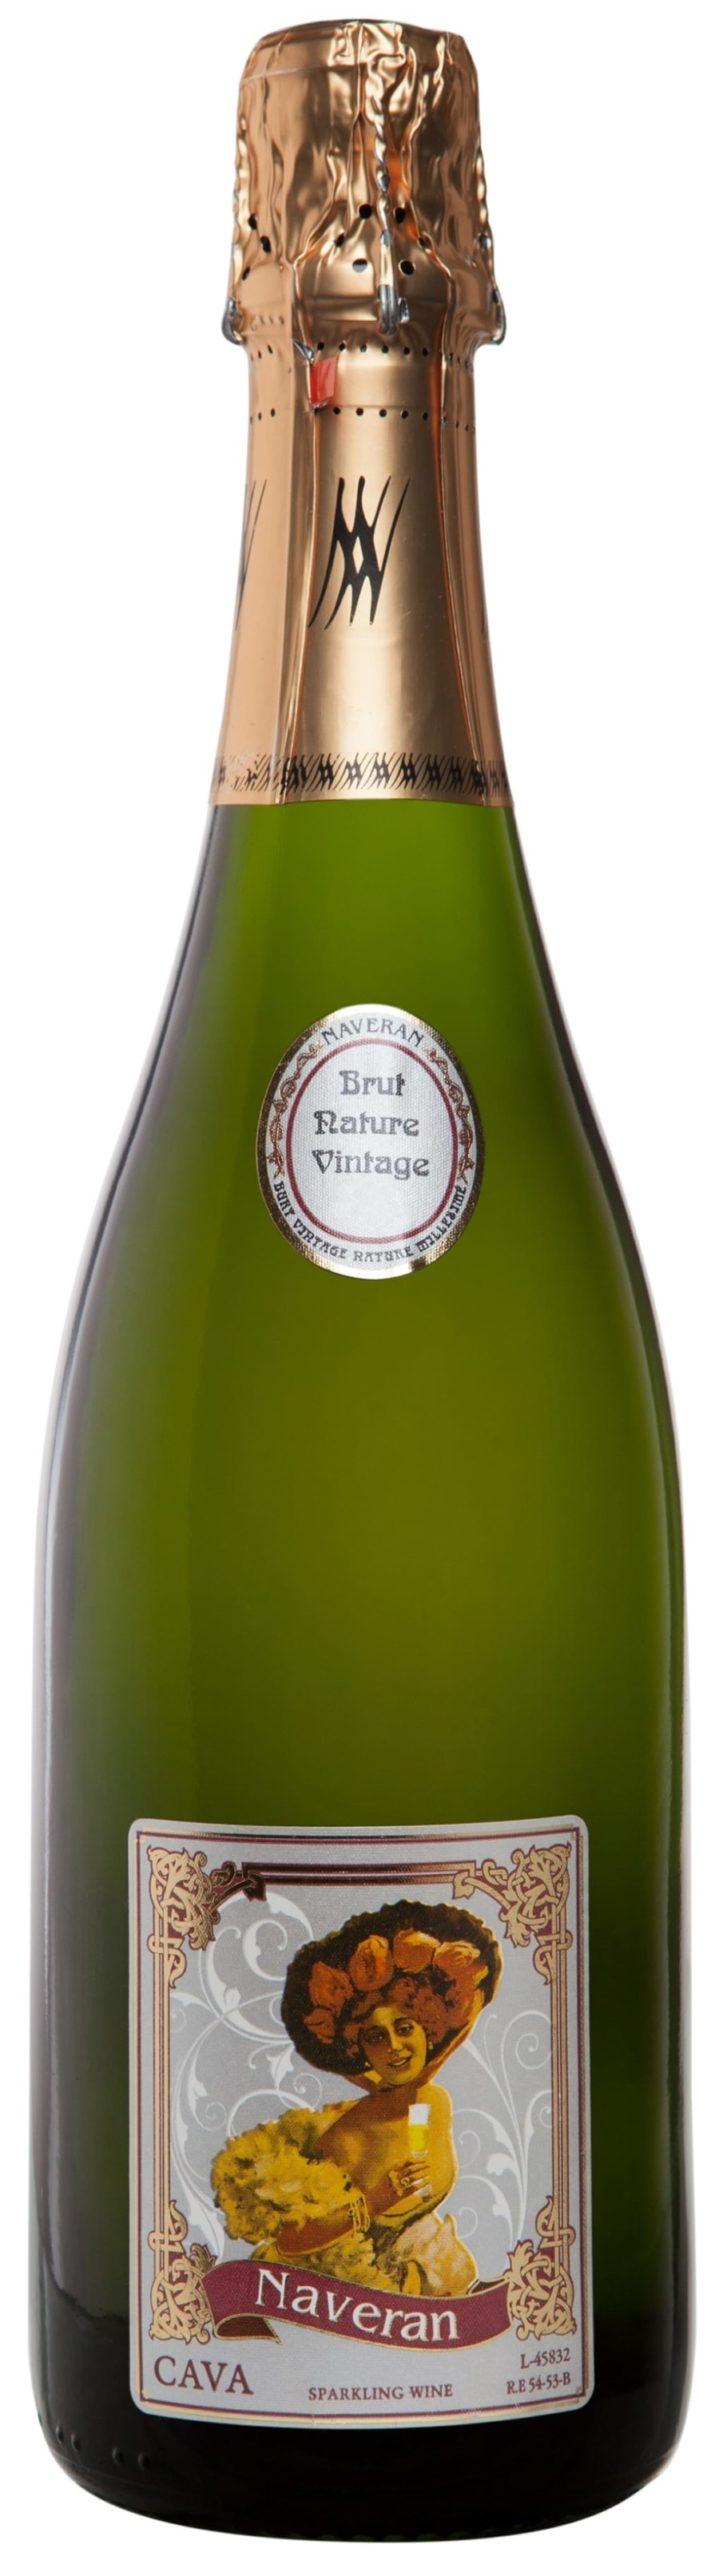 Bodegas Naveran Brut Cava 2018 sparkling wine